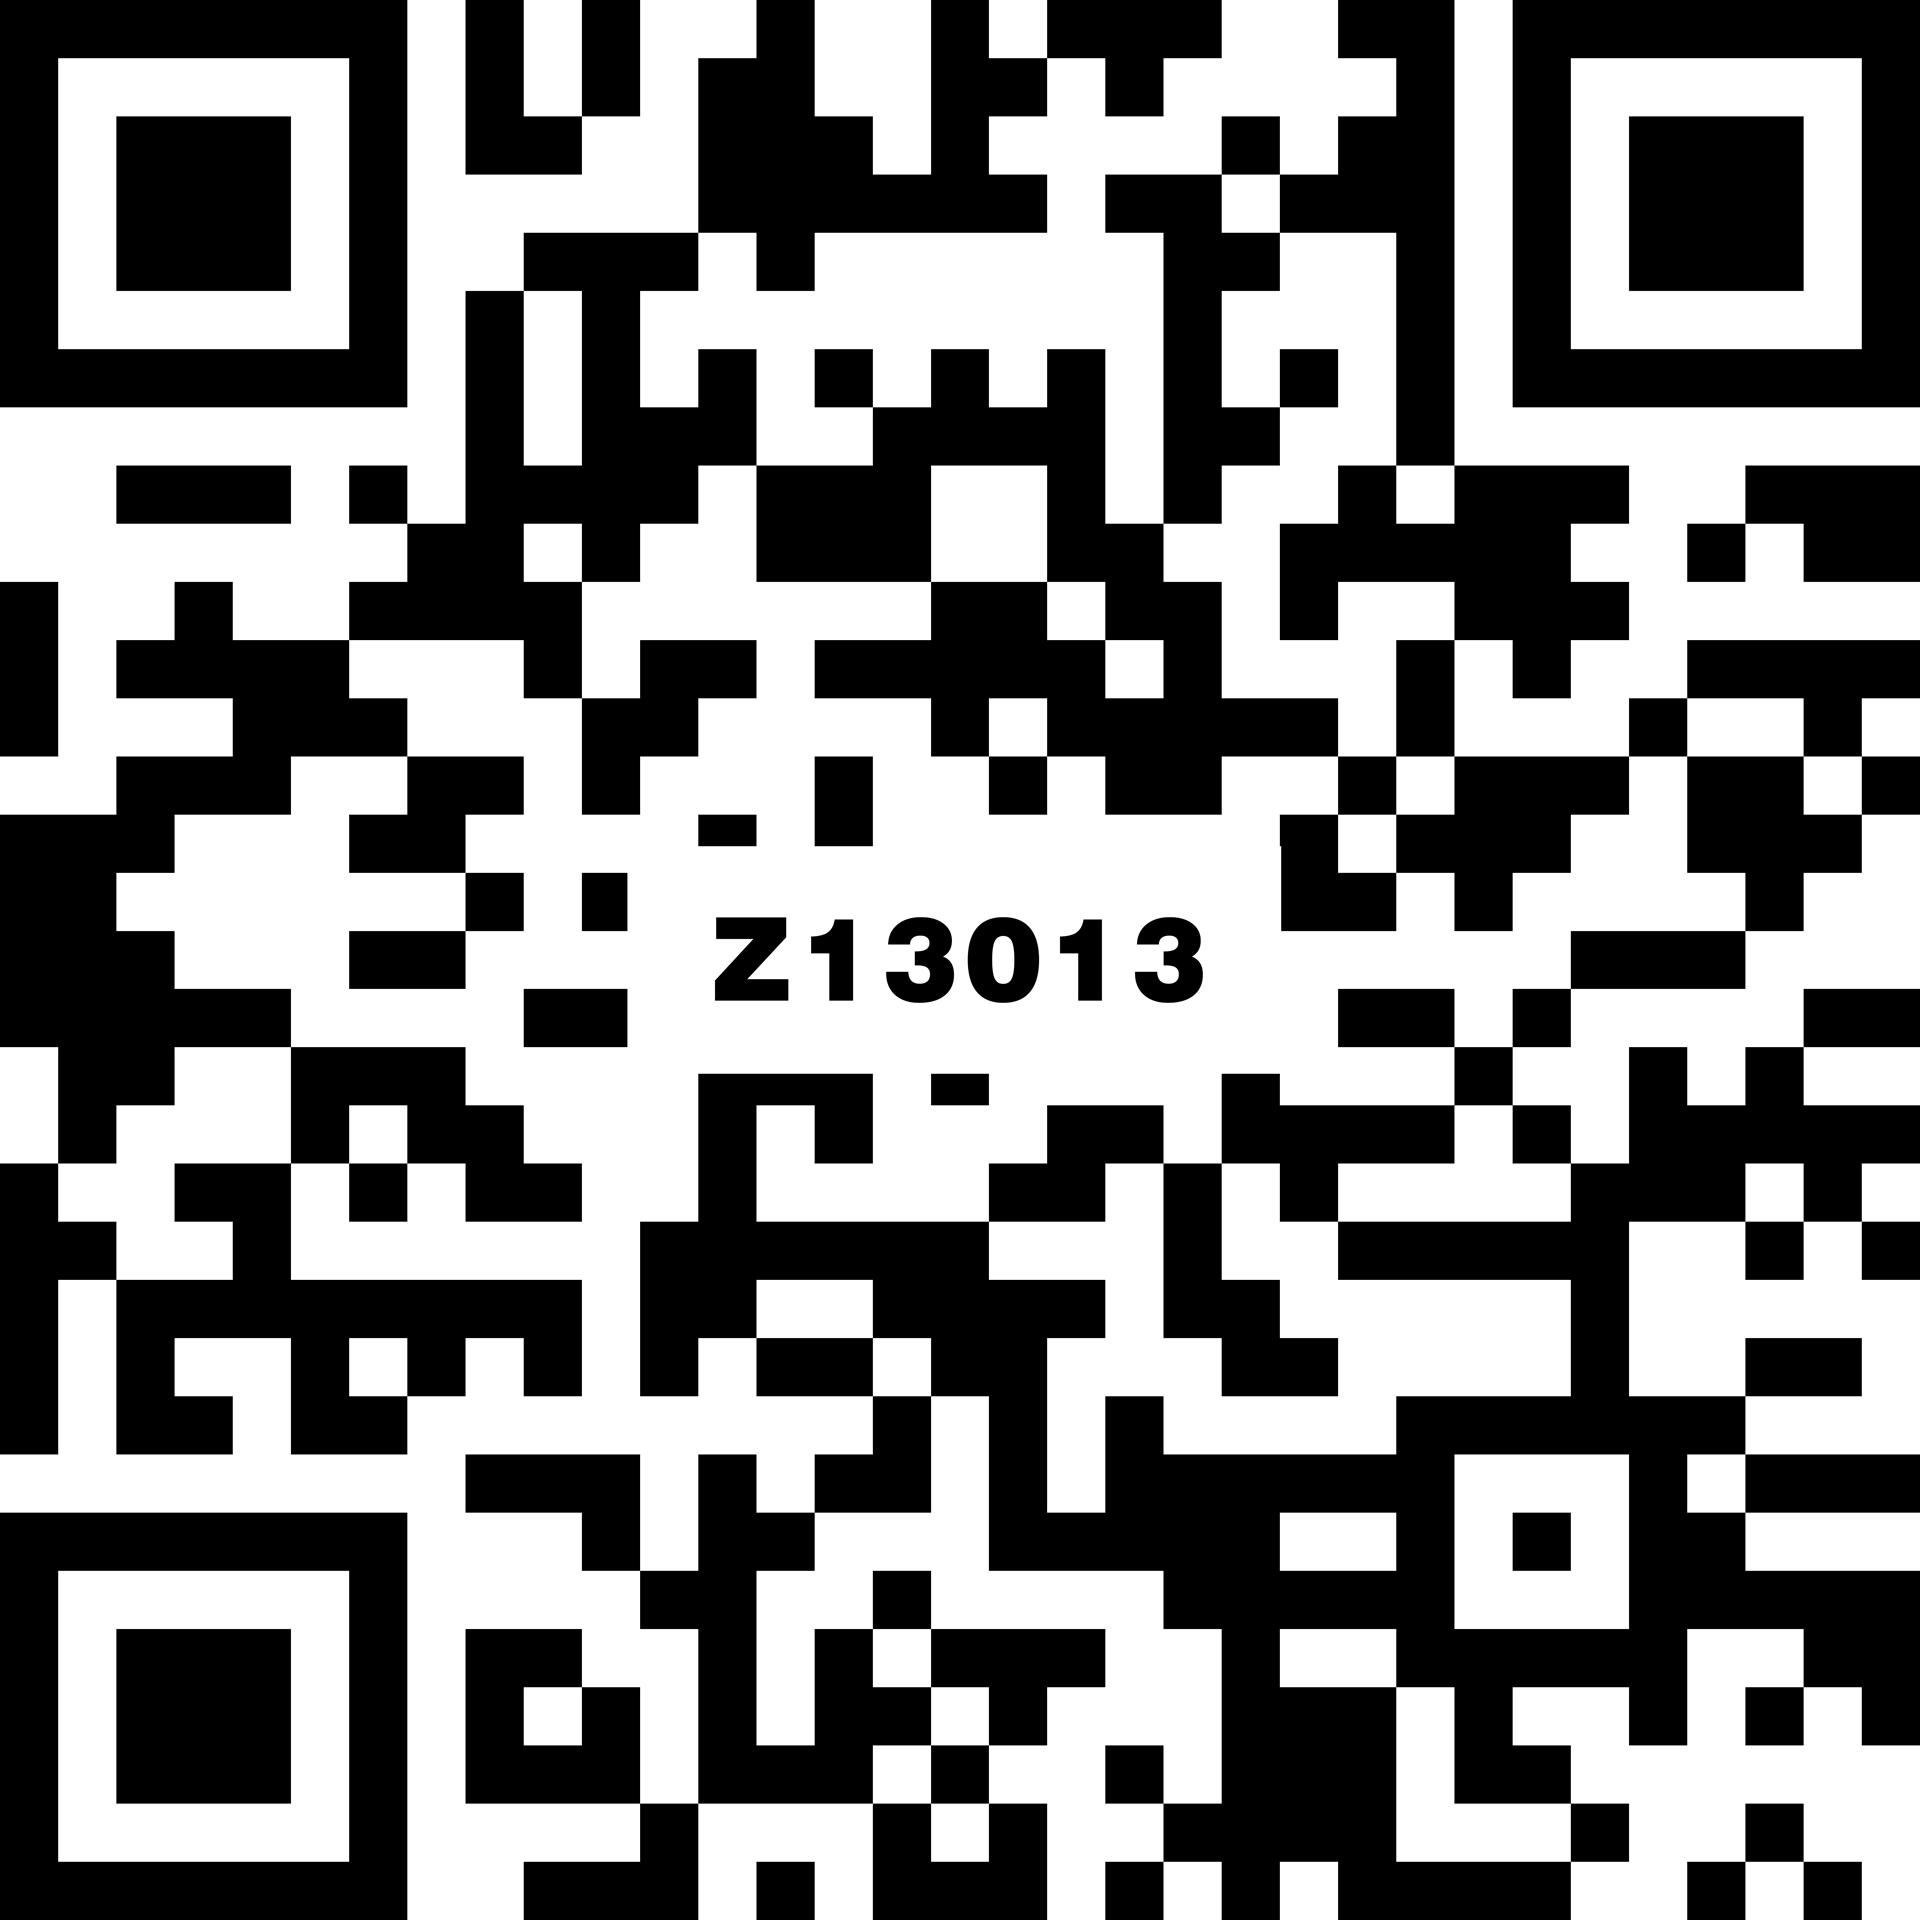 Z13013